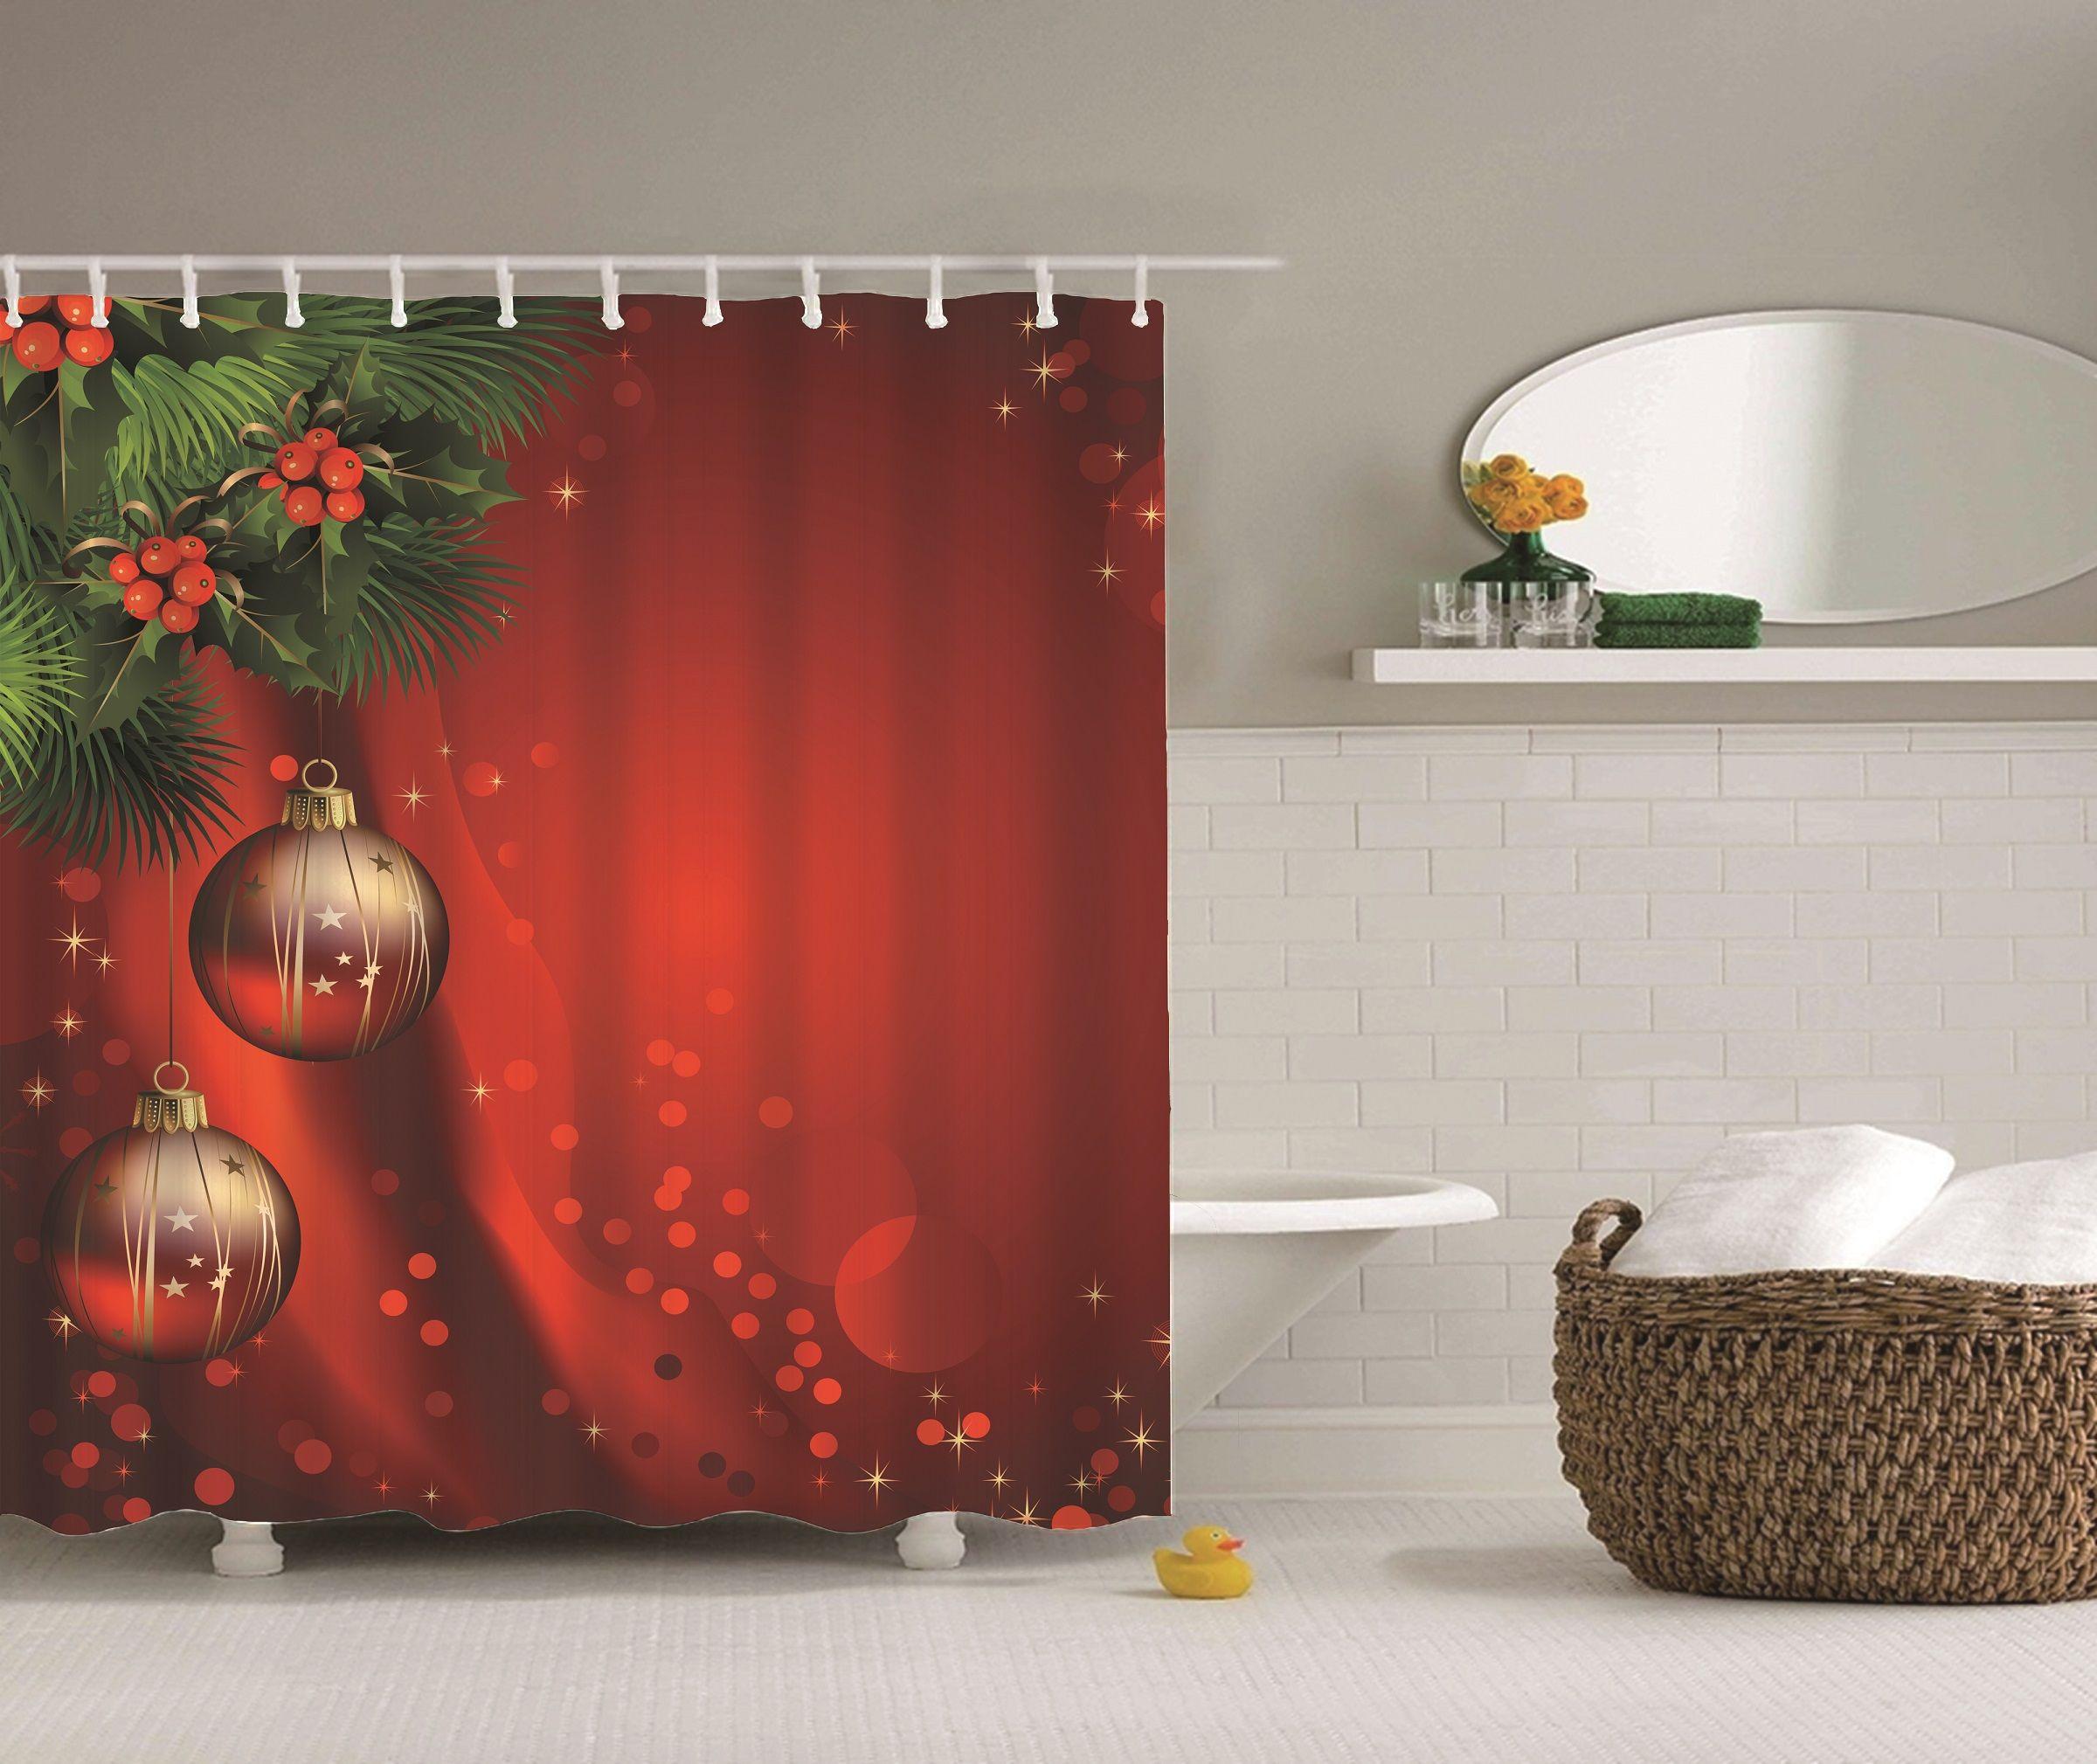 2019 Merry Christmas Festival Cartoon Shower Curtain Digital Printing Bath Curtain With Rings 71x71inch From Willwangtrade888 14 32 Dhgate Com